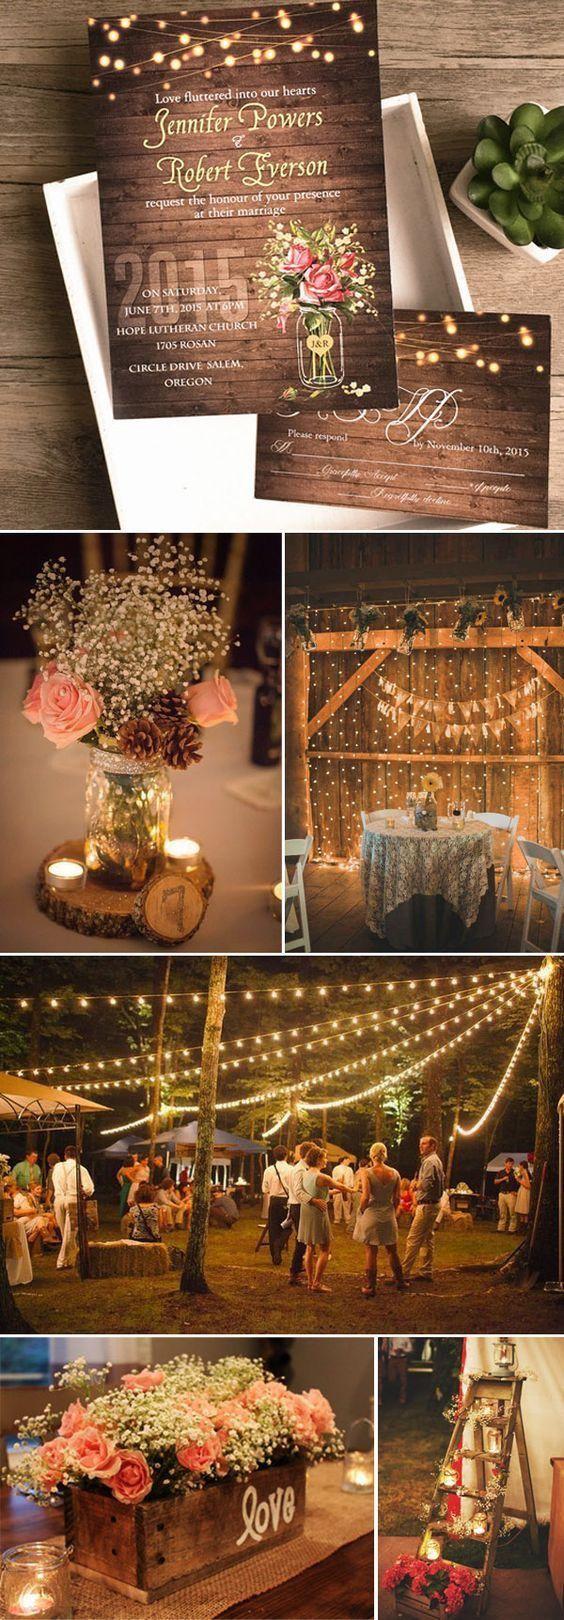 Wedding decorations at church november 2018  best Wedding images on Pinterest  Hairstyle ideas Wedding hair